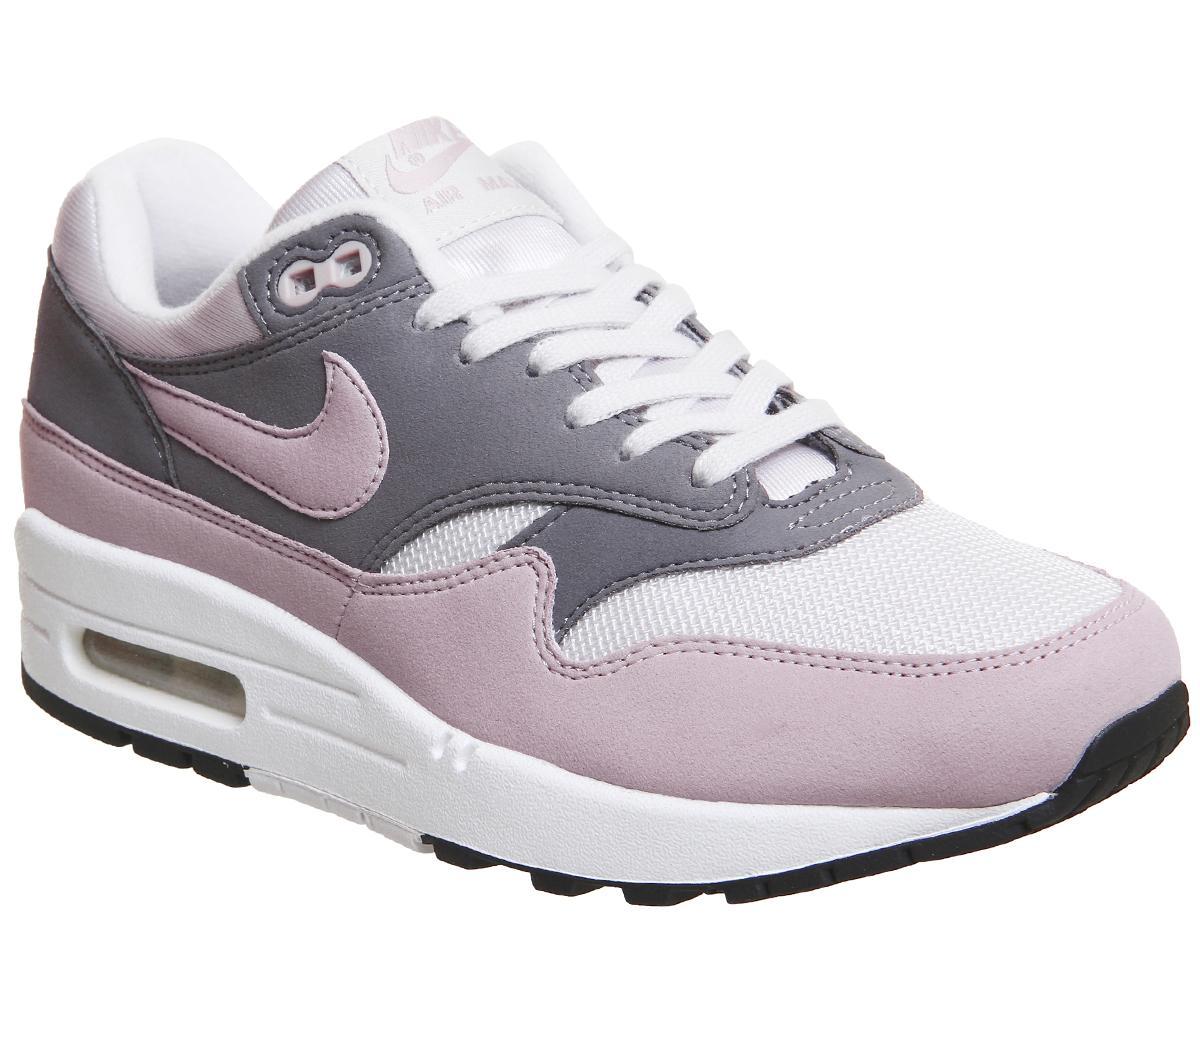 Nike Air Max 1 Trainers Vast Grey